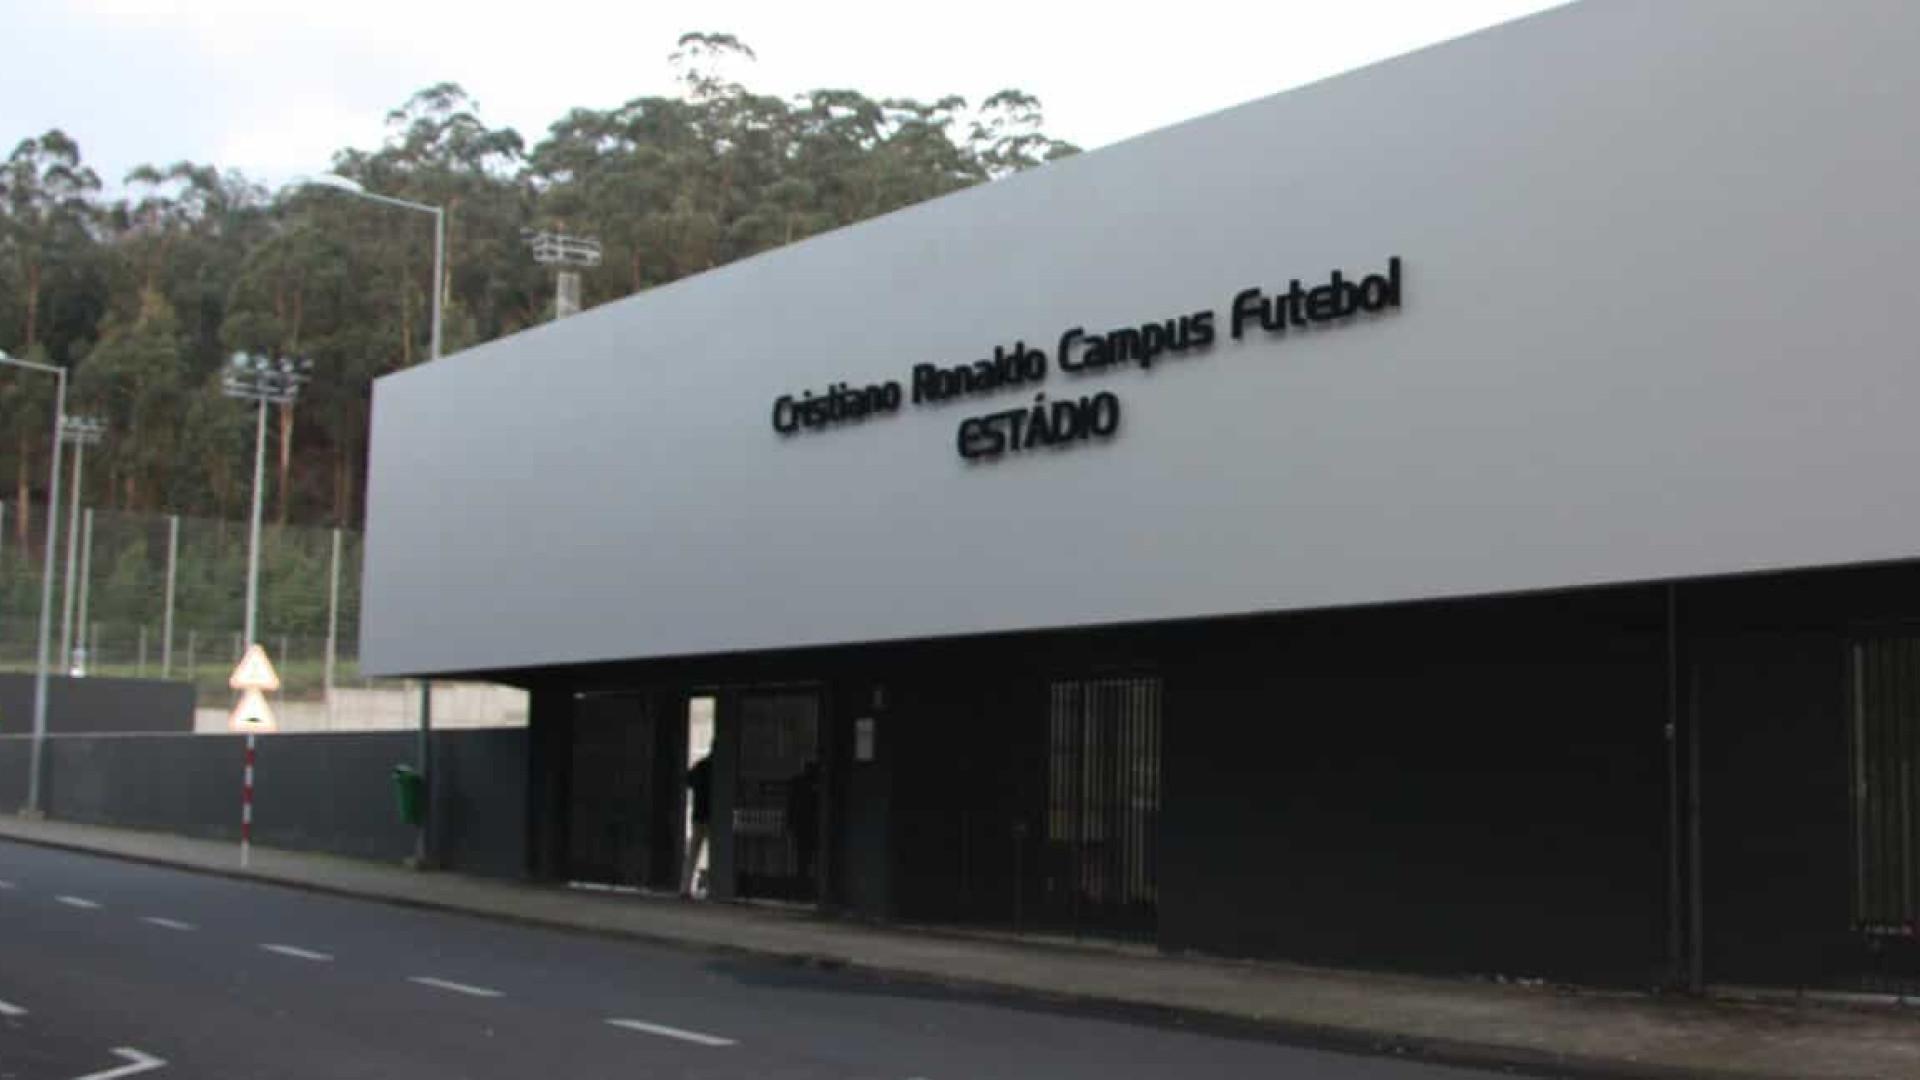 Academia Cristiano Ronaldo indigna Nacional. Clube envia carta a Varandas